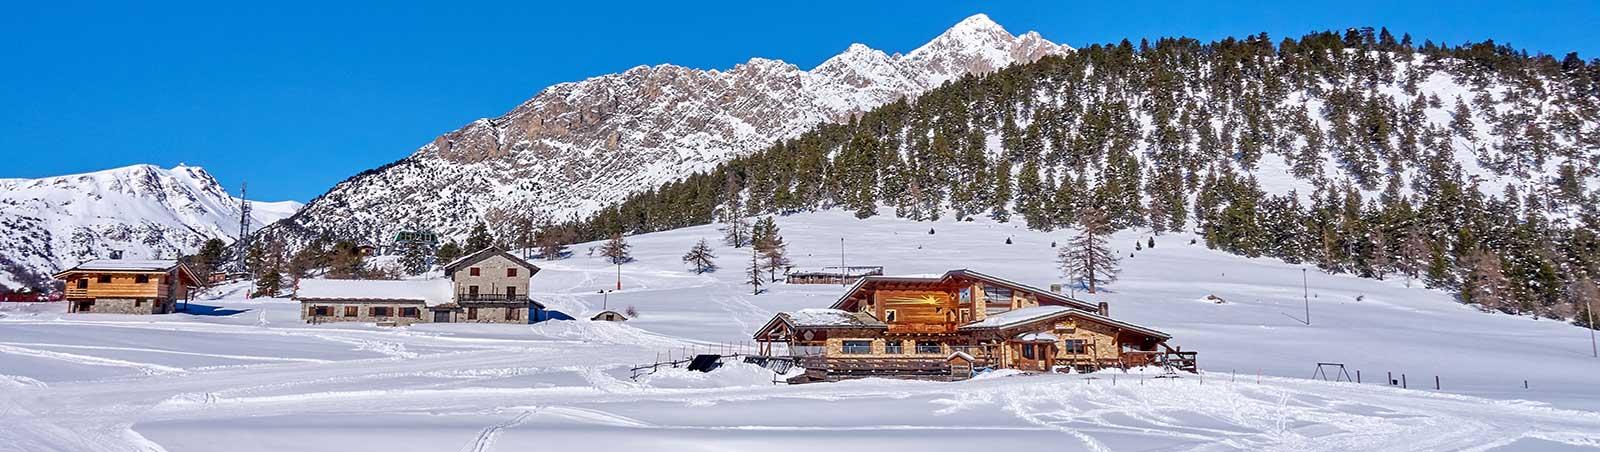 Claviere, Italy School Ski Trips